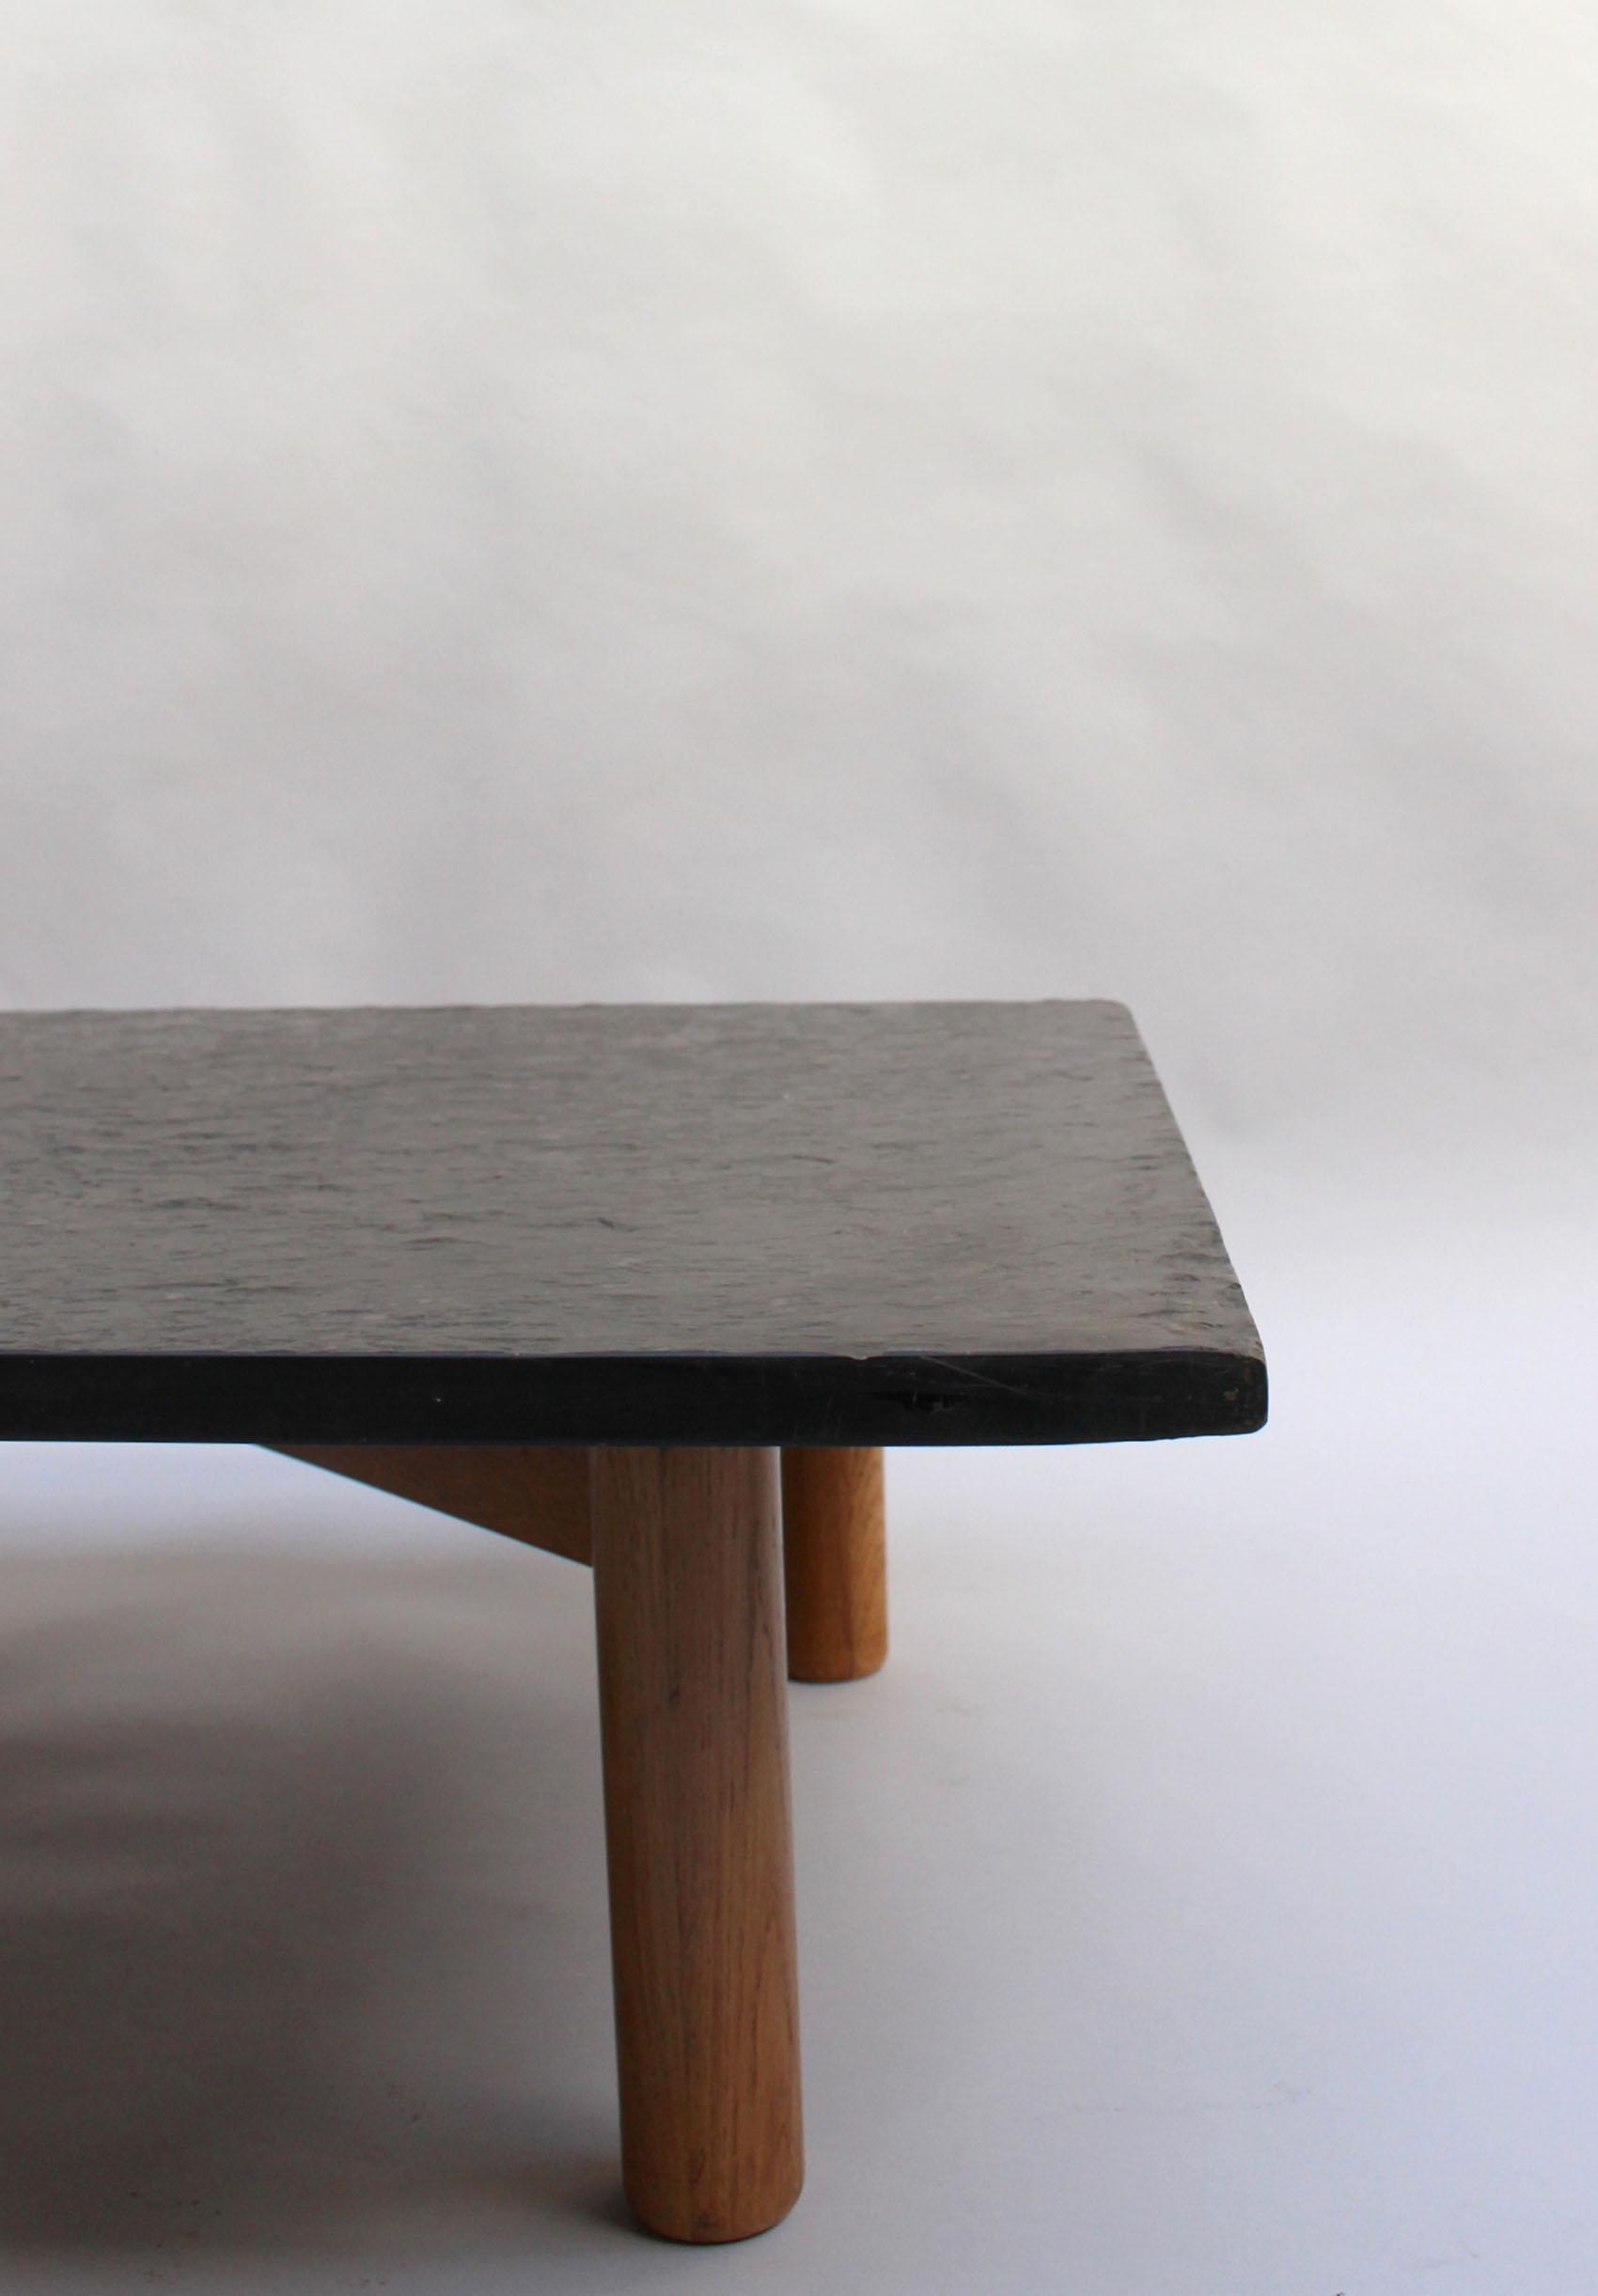 1594 Table Basse Bois Ardoise 10